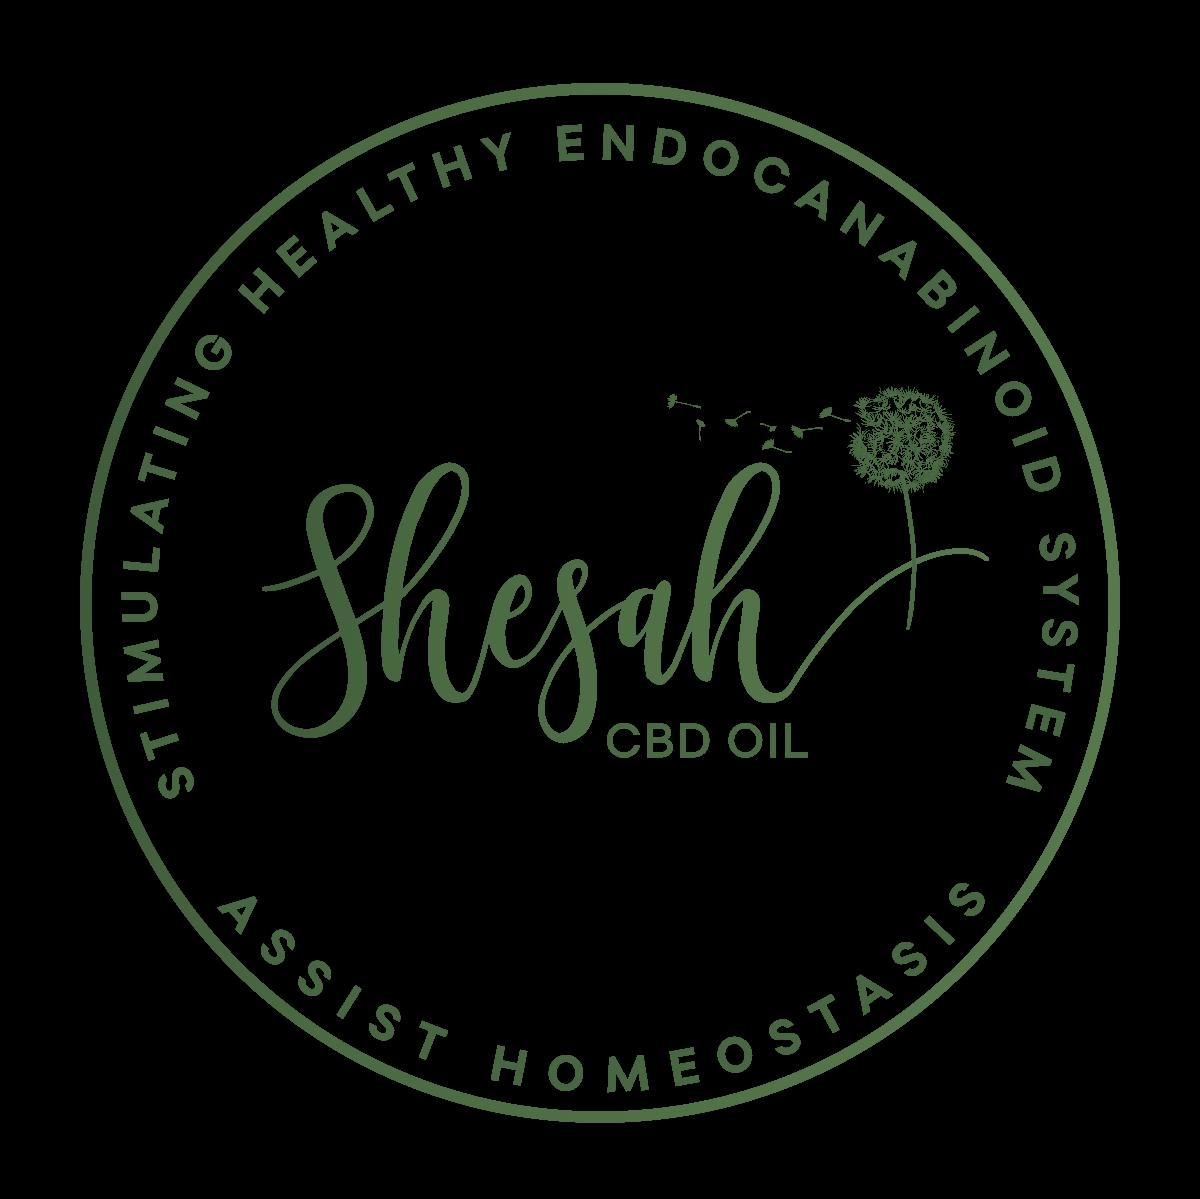 Logo design for CBD Oil company